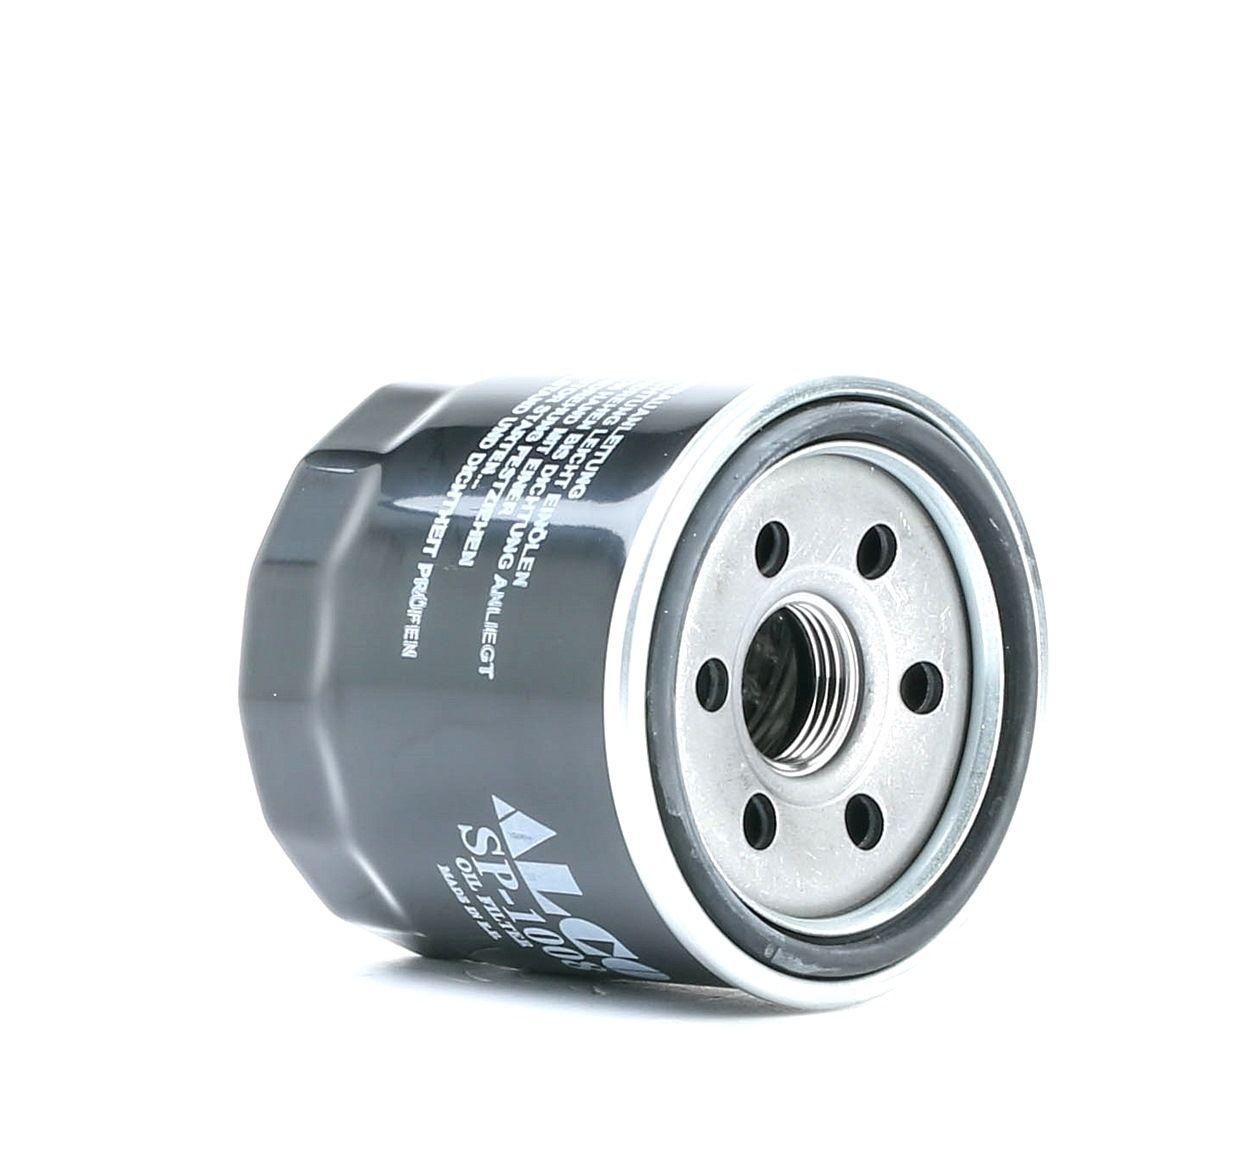 Filter ALCO FILTER SP-1008 Bewertung